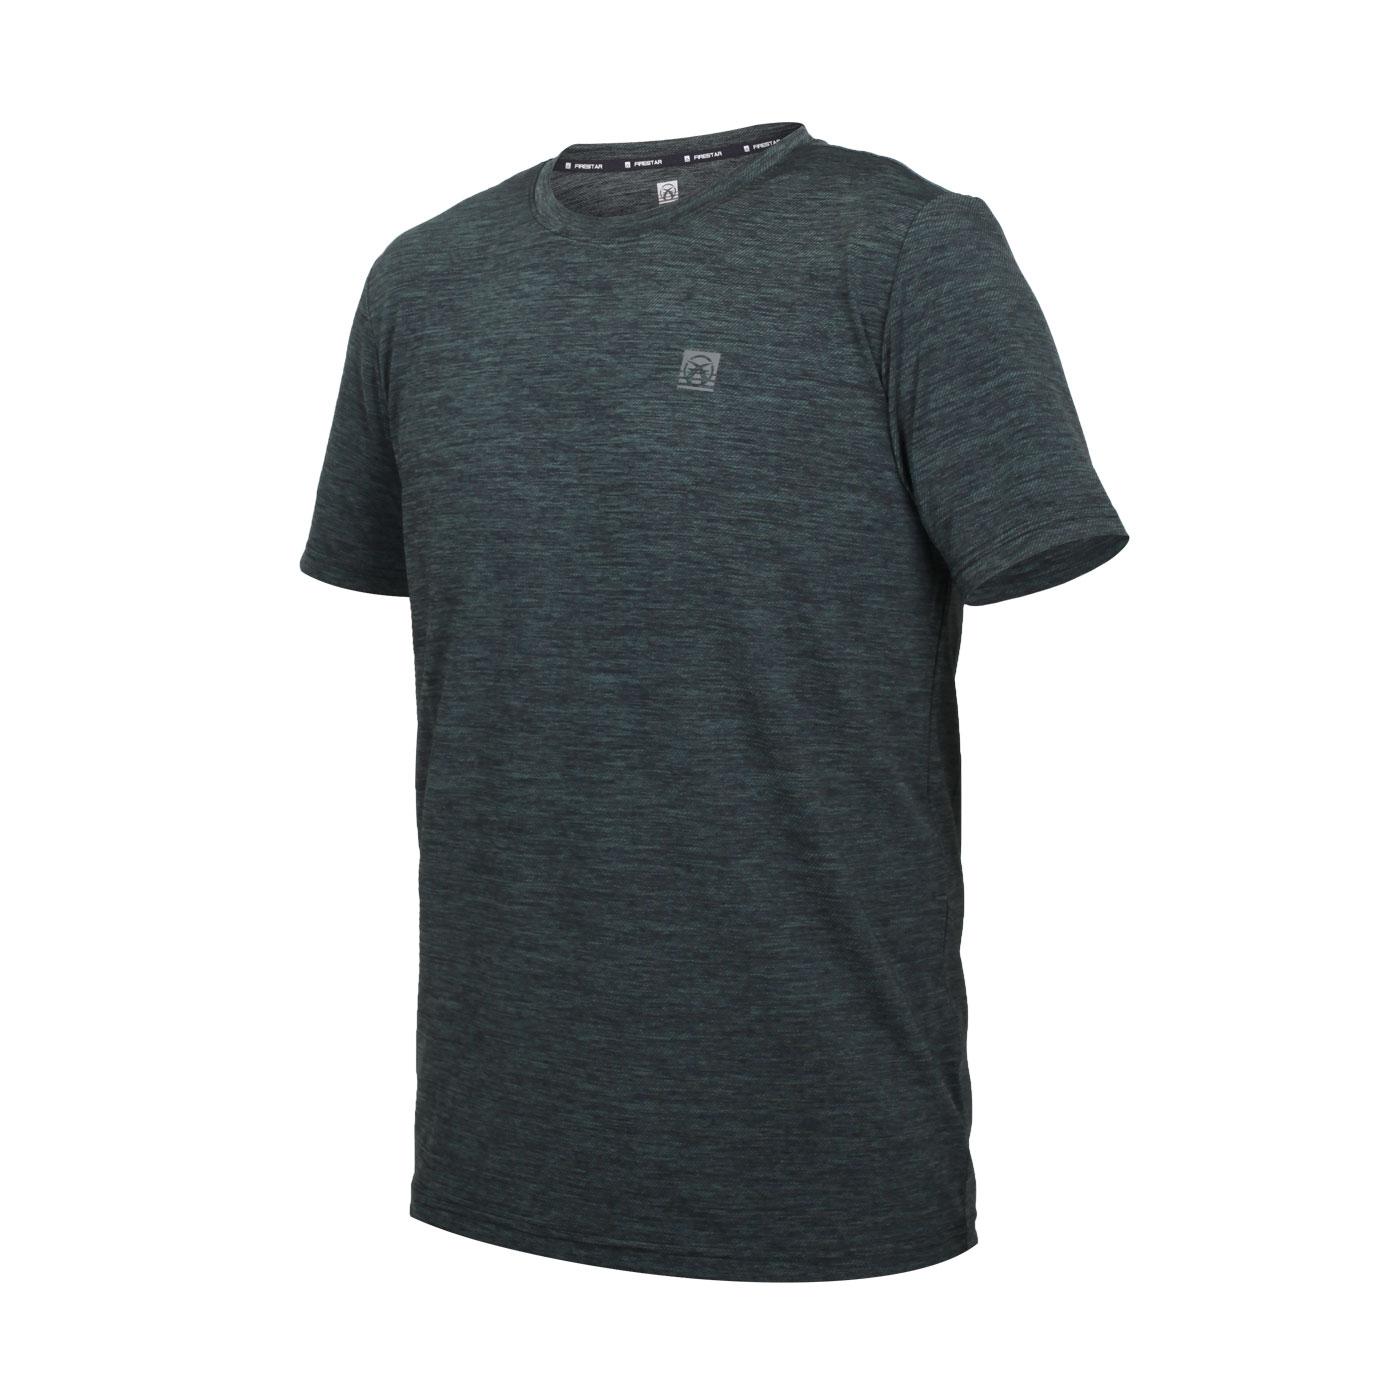 FIRESTAR 男款彈性機能圓領T恤 D1731-18 - 麻花灰